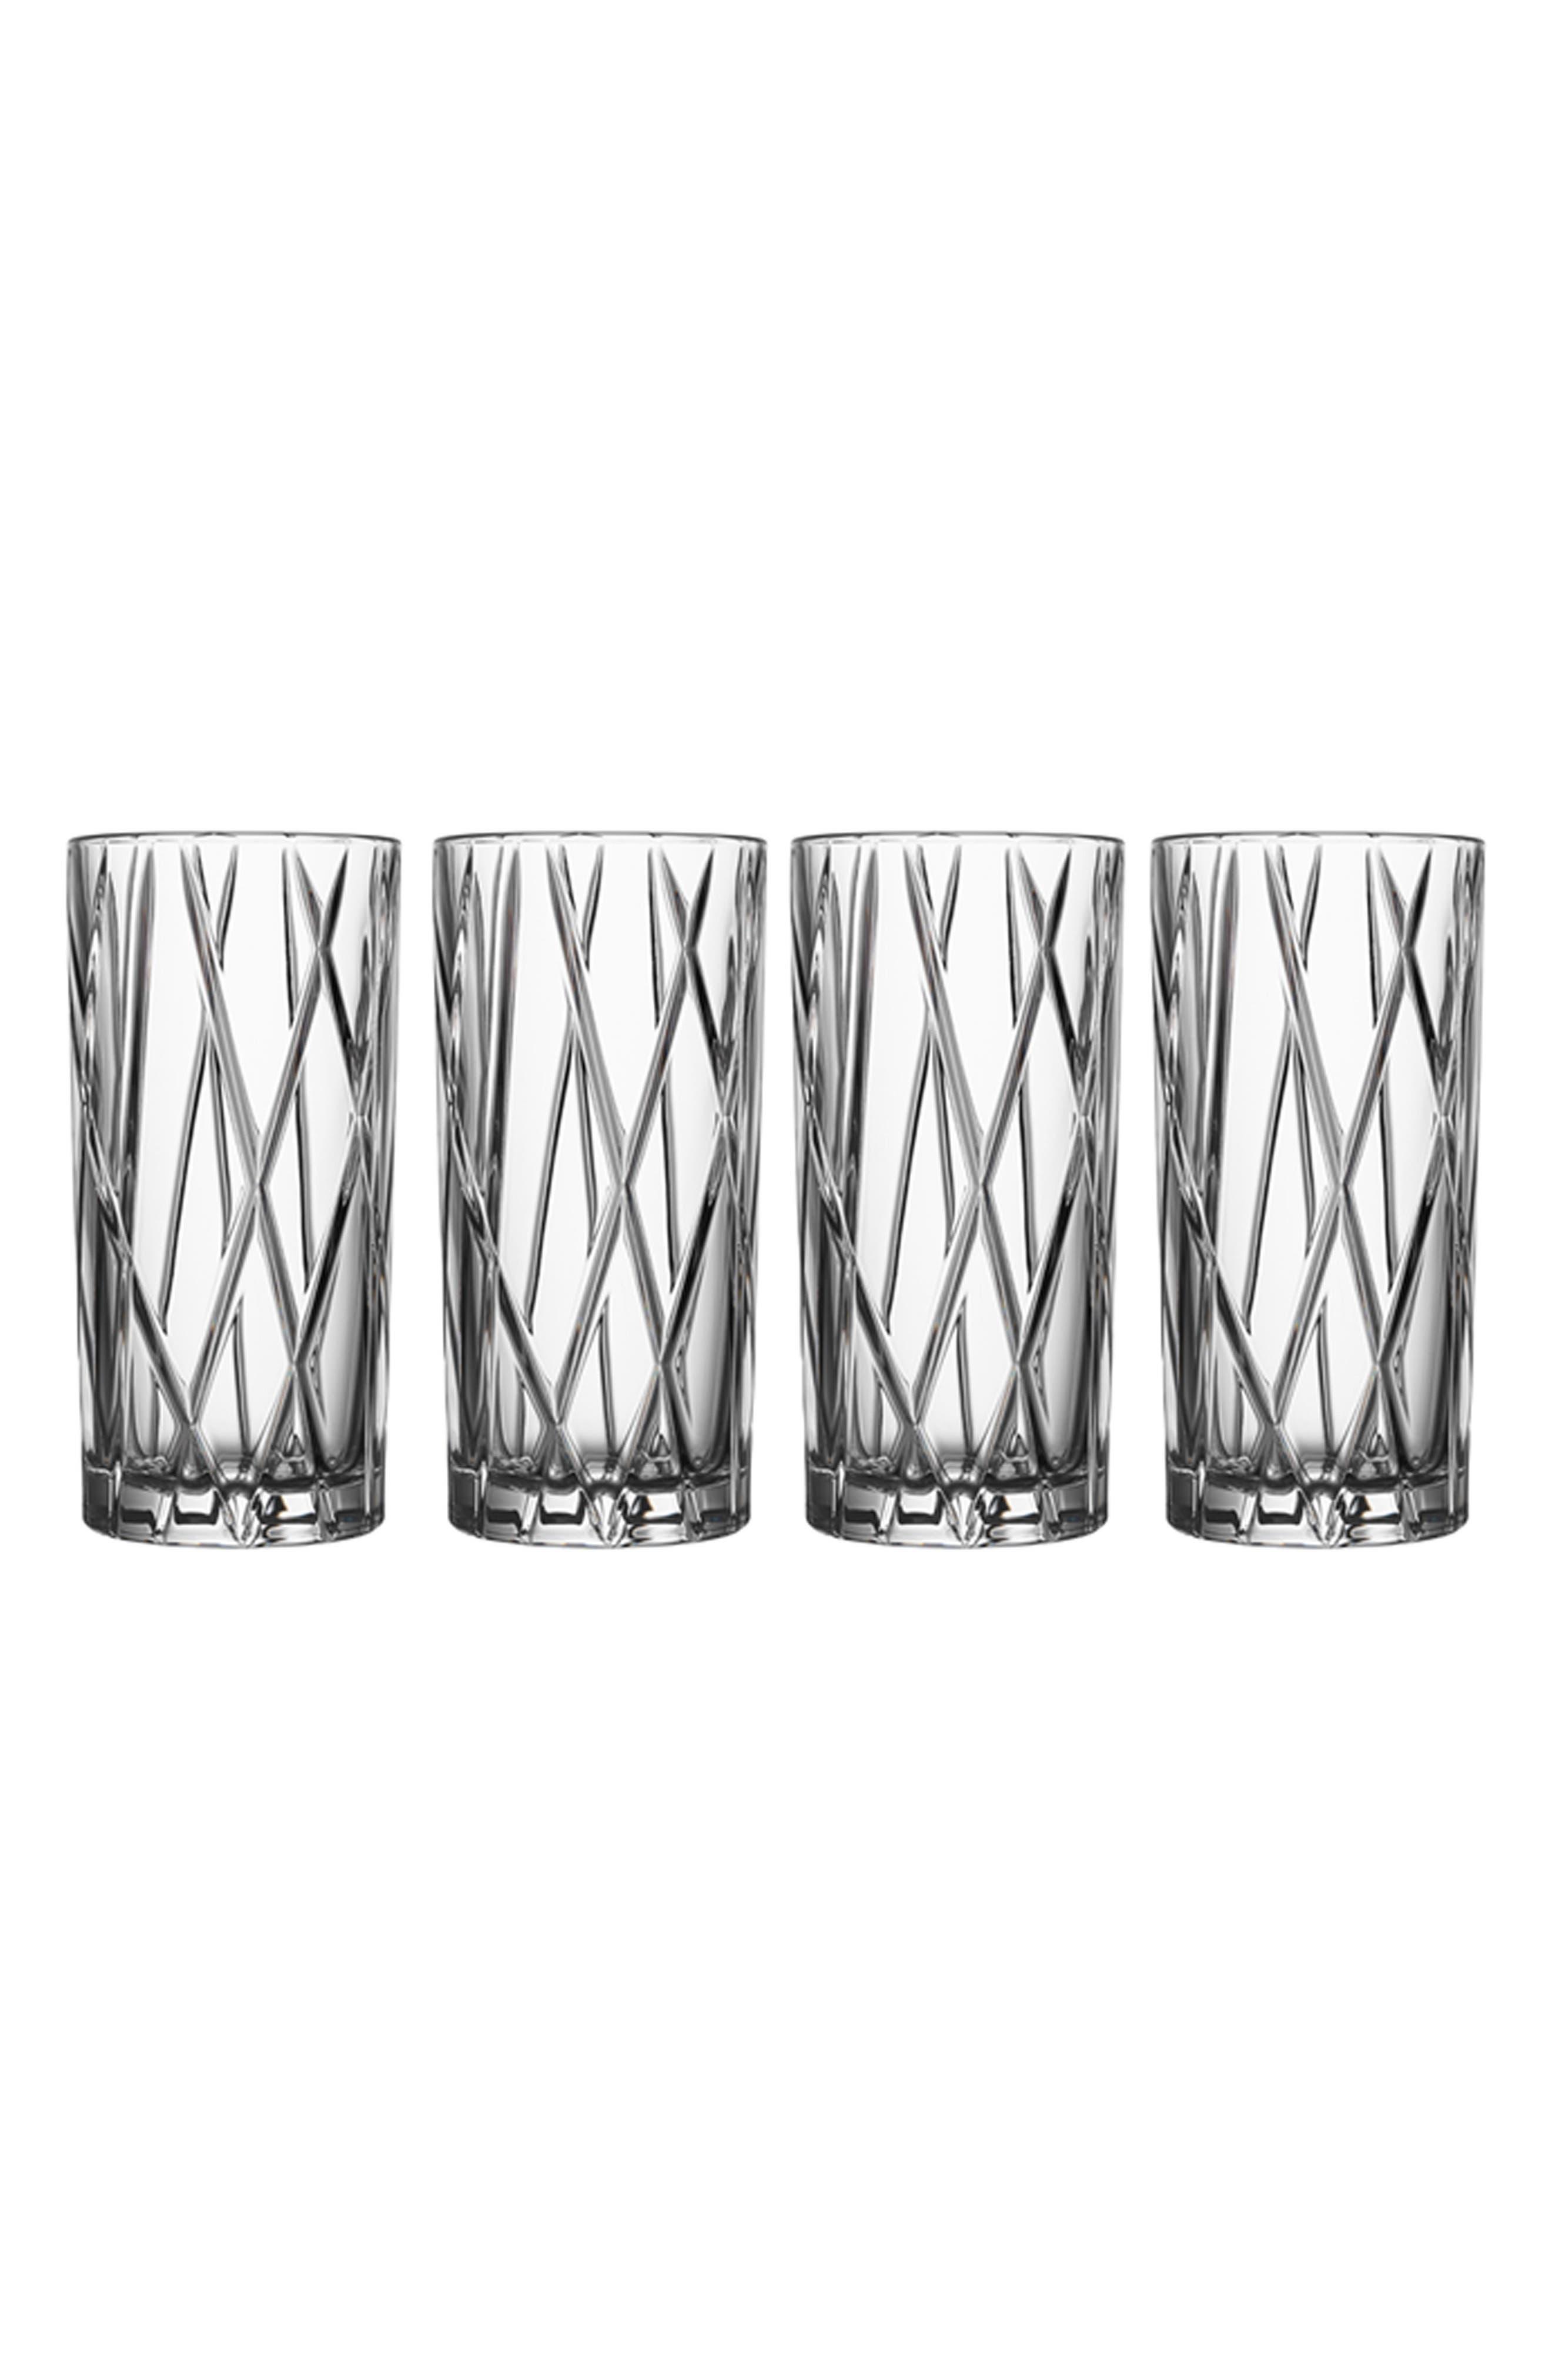 City Set of 4 Crystal Highball Glasses,                             Main thumbnail 1, color,                             100